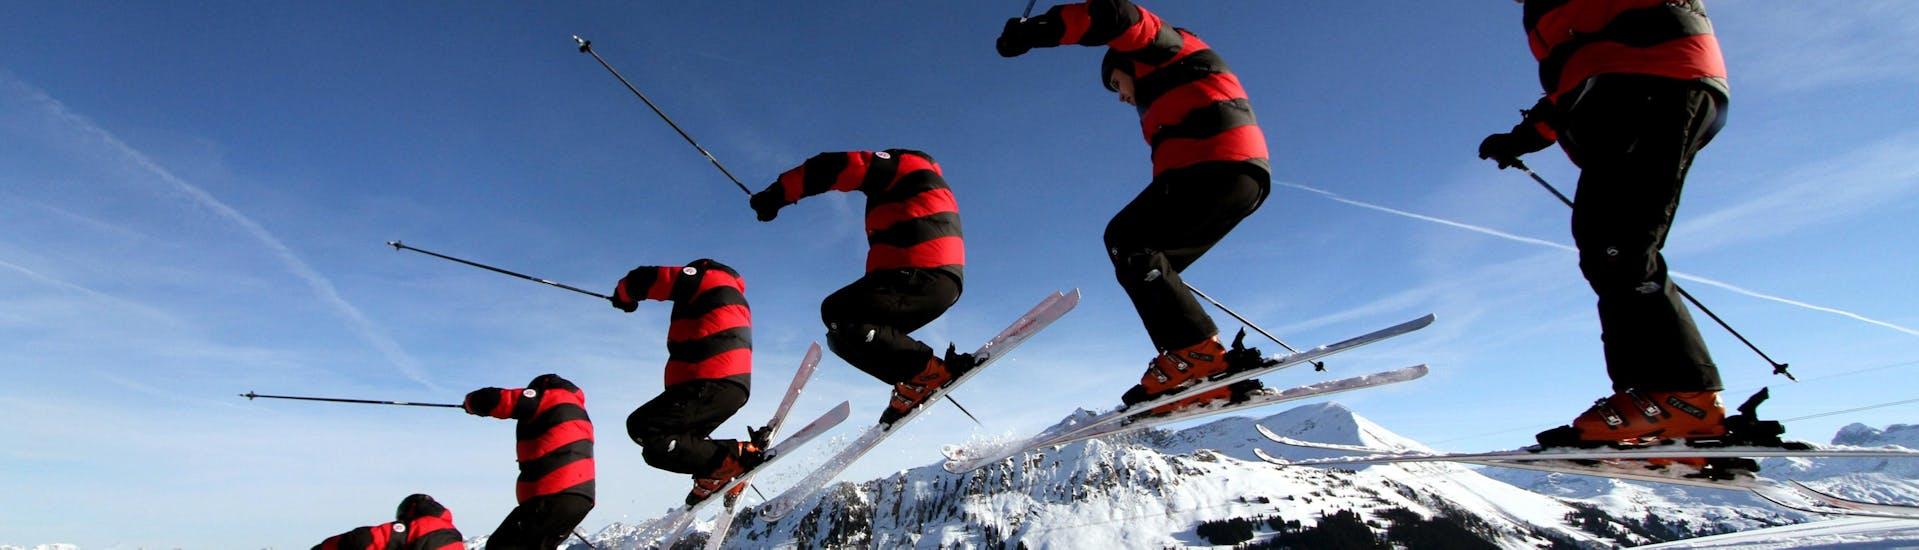 Lezioni private di sci per adulti a partire da 15 anni per tutti i livelli